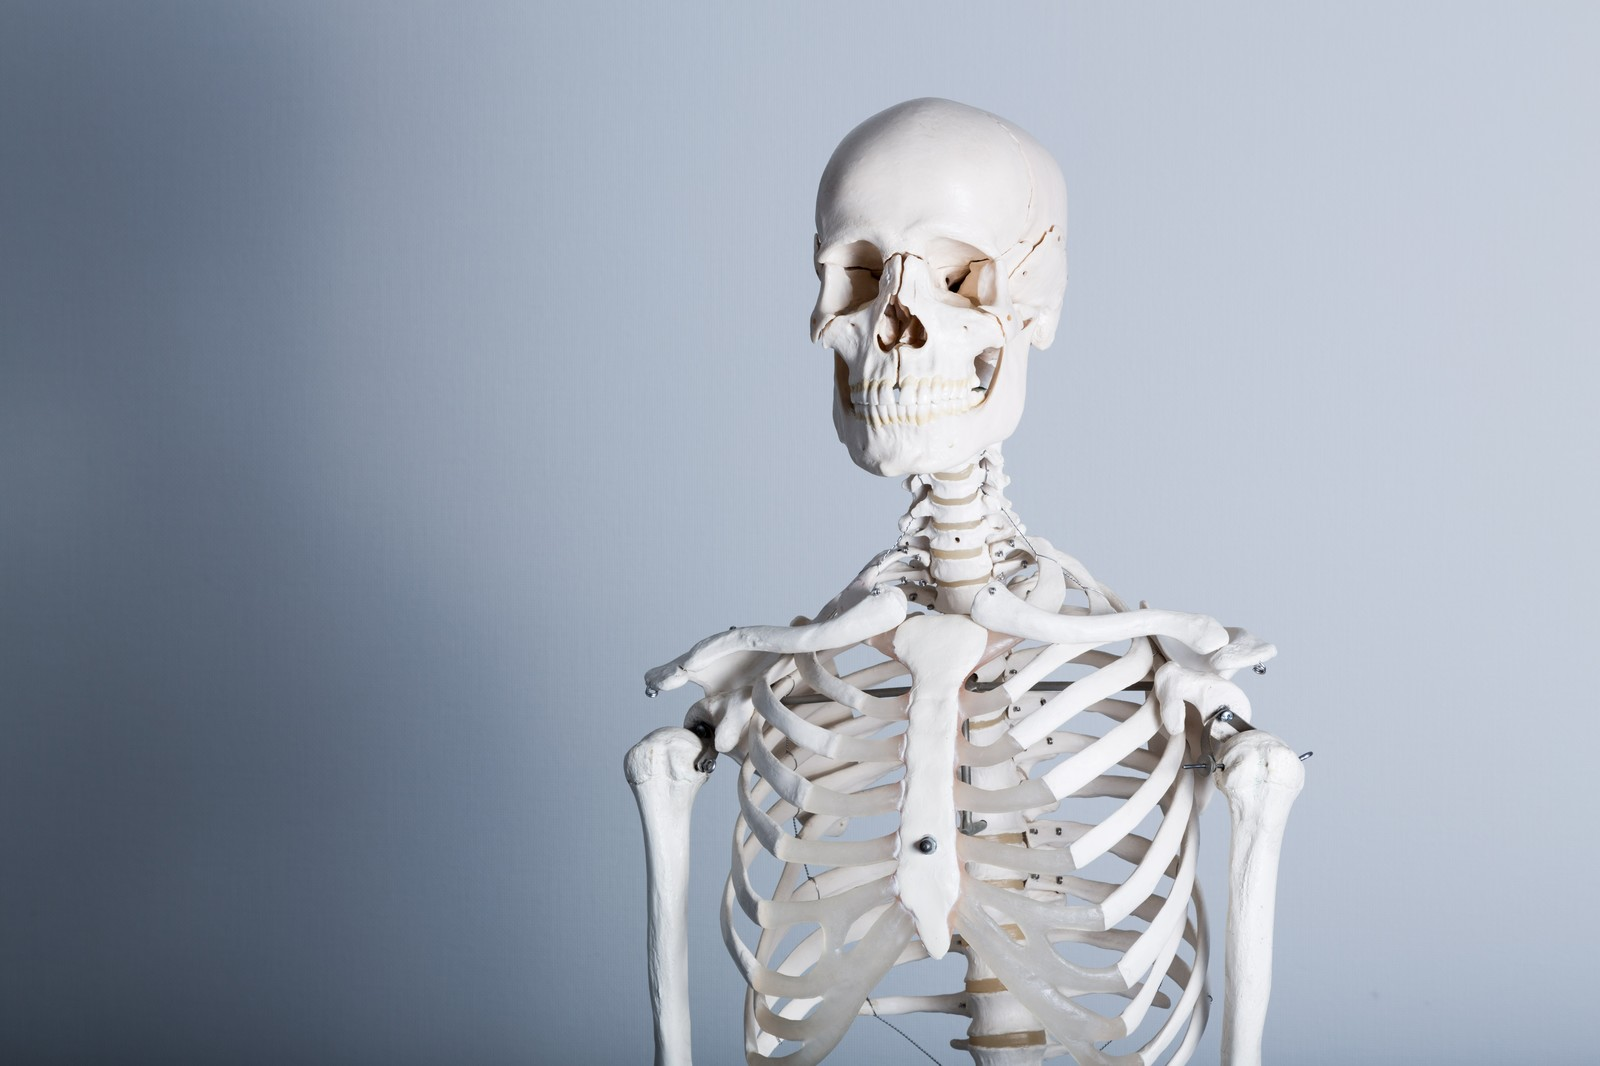 「骨格標本」の写真